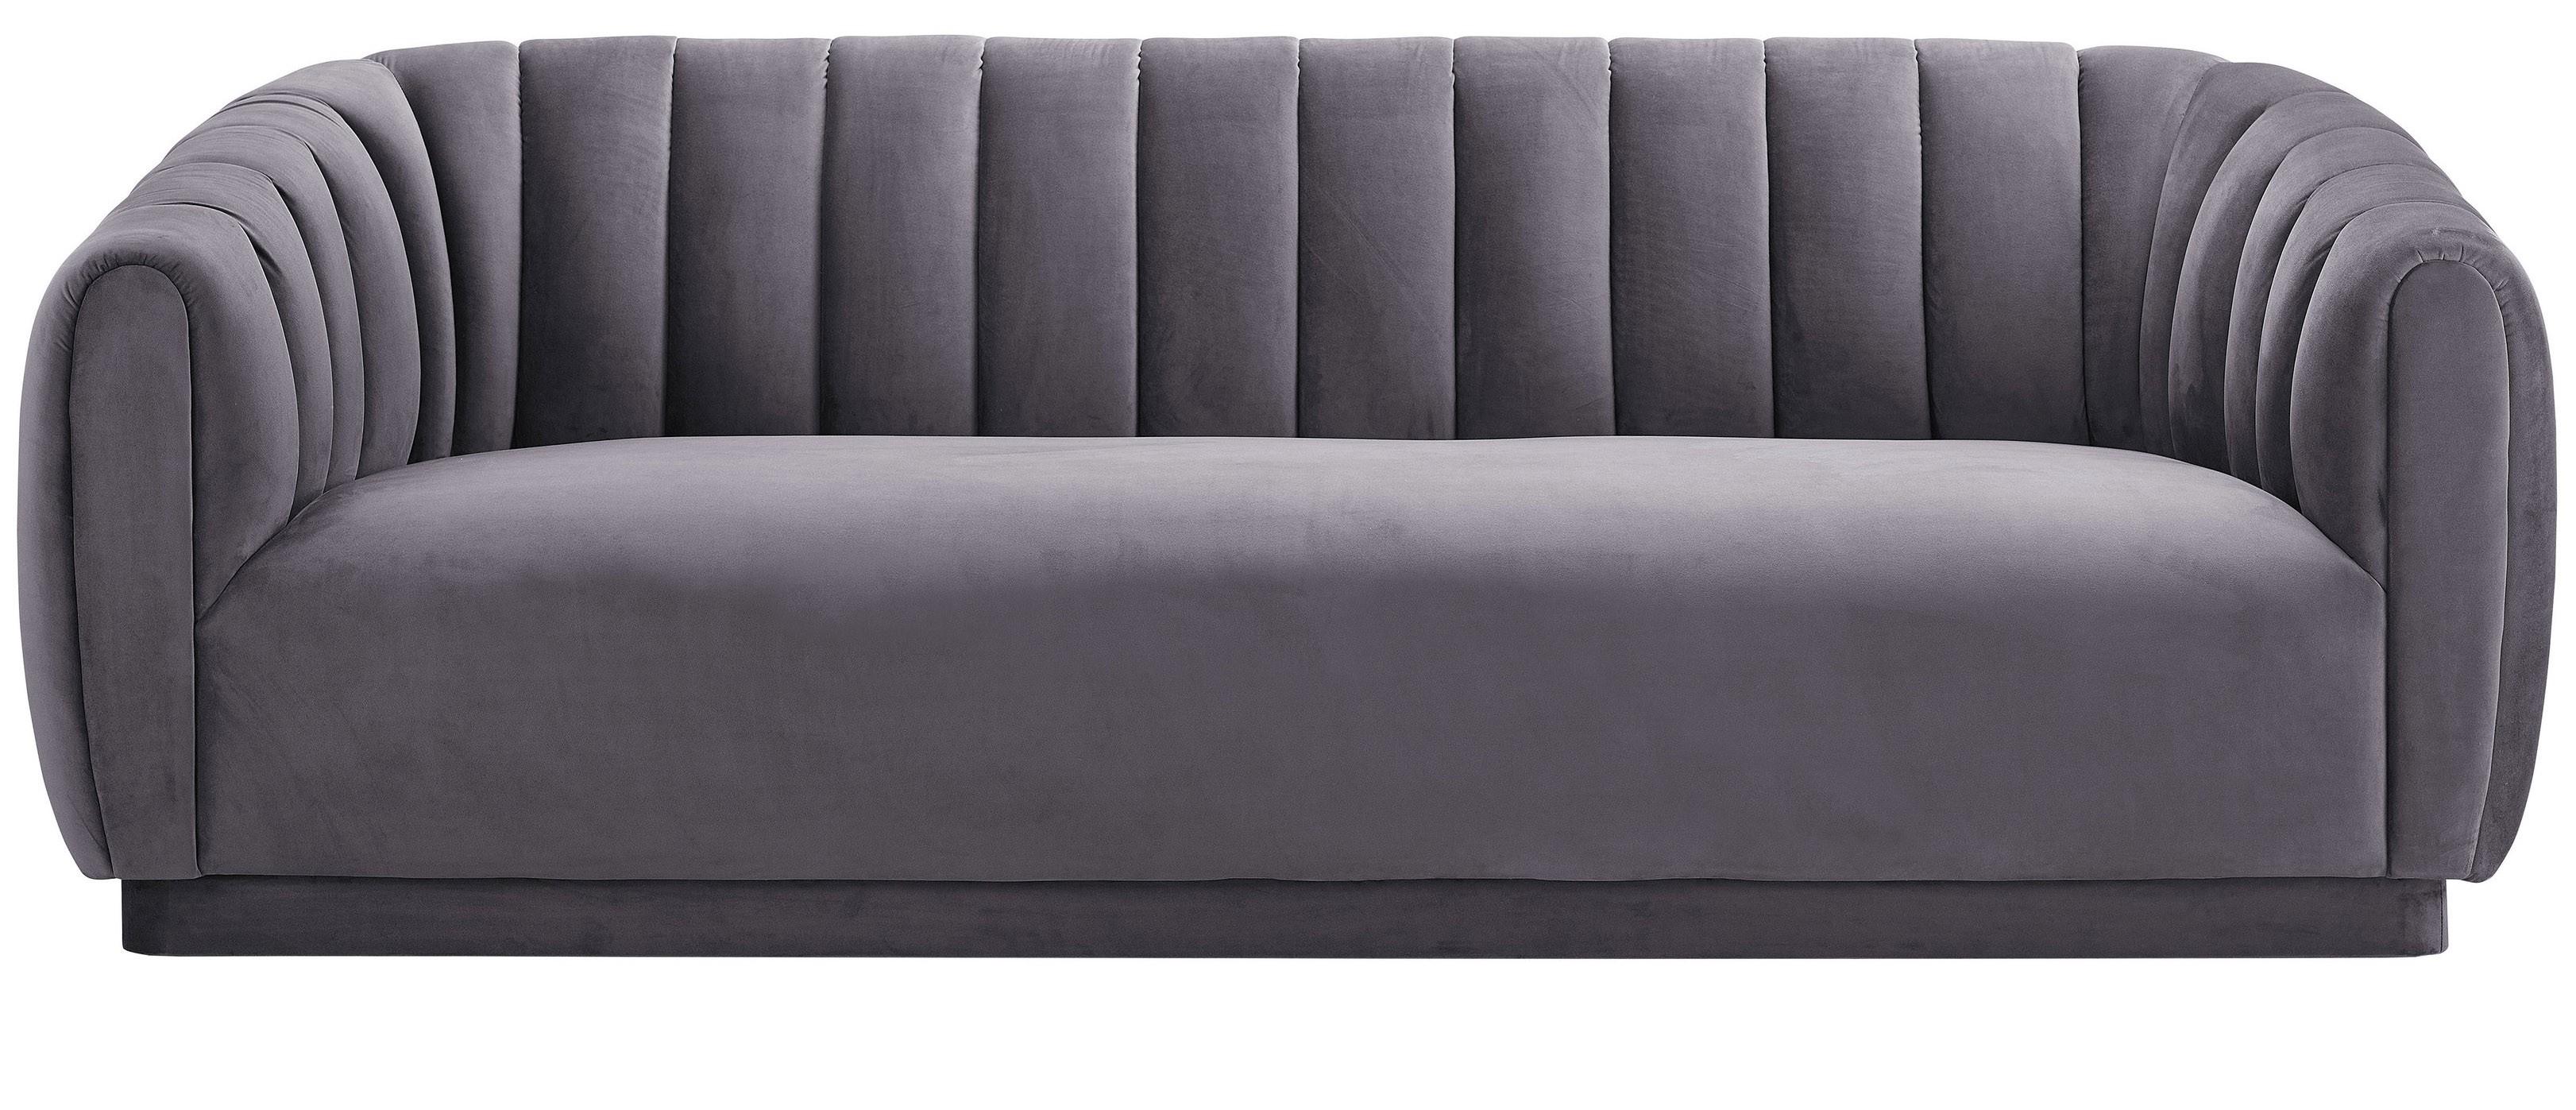 Marissa Velvet Sofa, Gray For Marissa Sofa Chairs (Image 18 of 20)